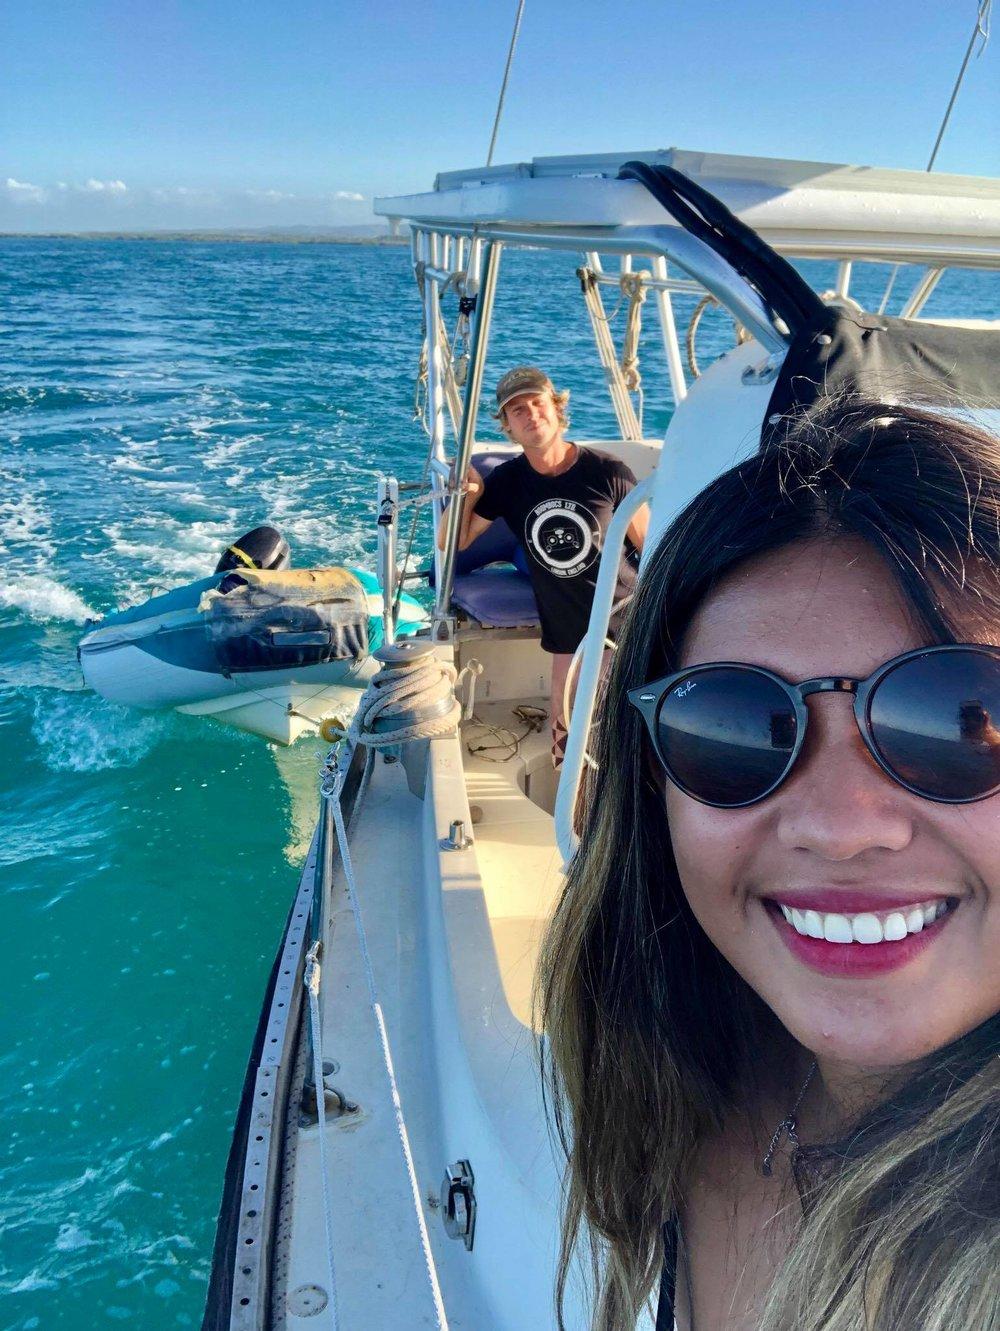 Sailing Life Day 309 Sailing (actually motoring) from Puerto Real to Boqueron, Puerto Rico1.jpg